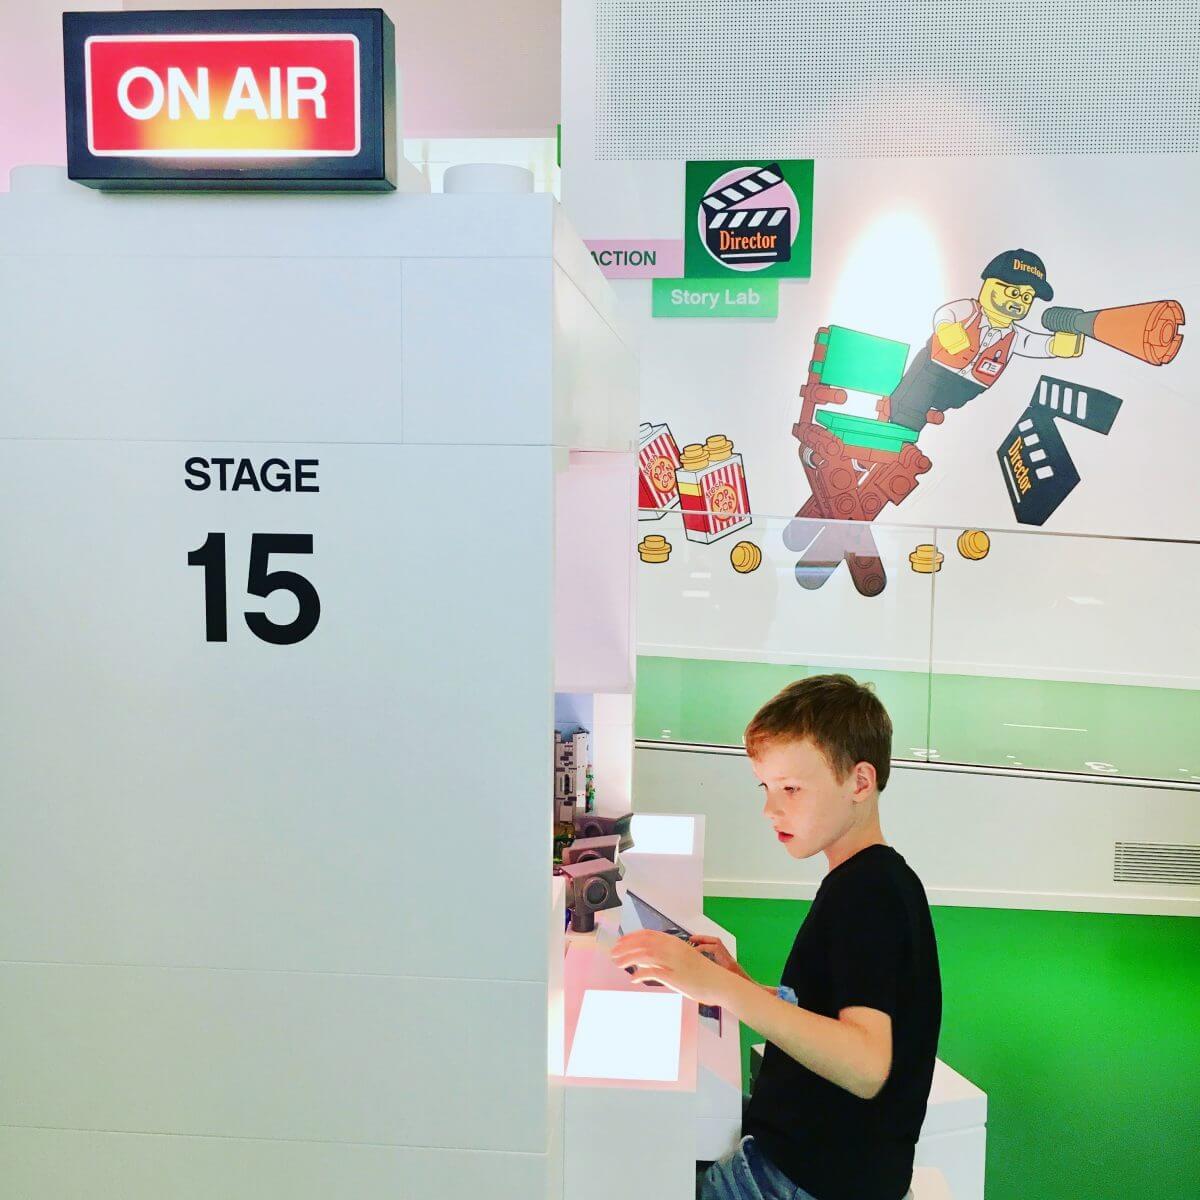 Stop-motion filmpjes maken in LEGO House vlakbij Legoland Billund